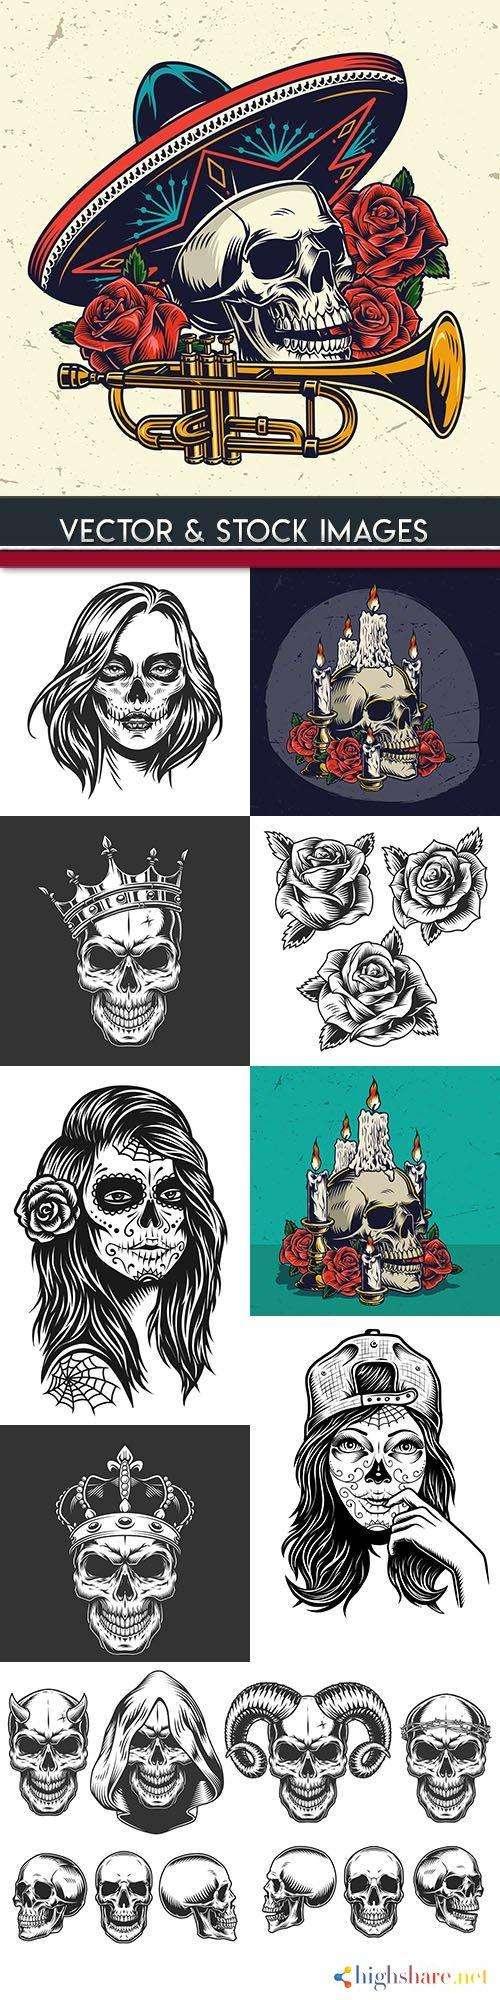 skull and dead head tattoo grunge illustration 5f4271afeab3d - Skull and dead head tattoo grunge illustration